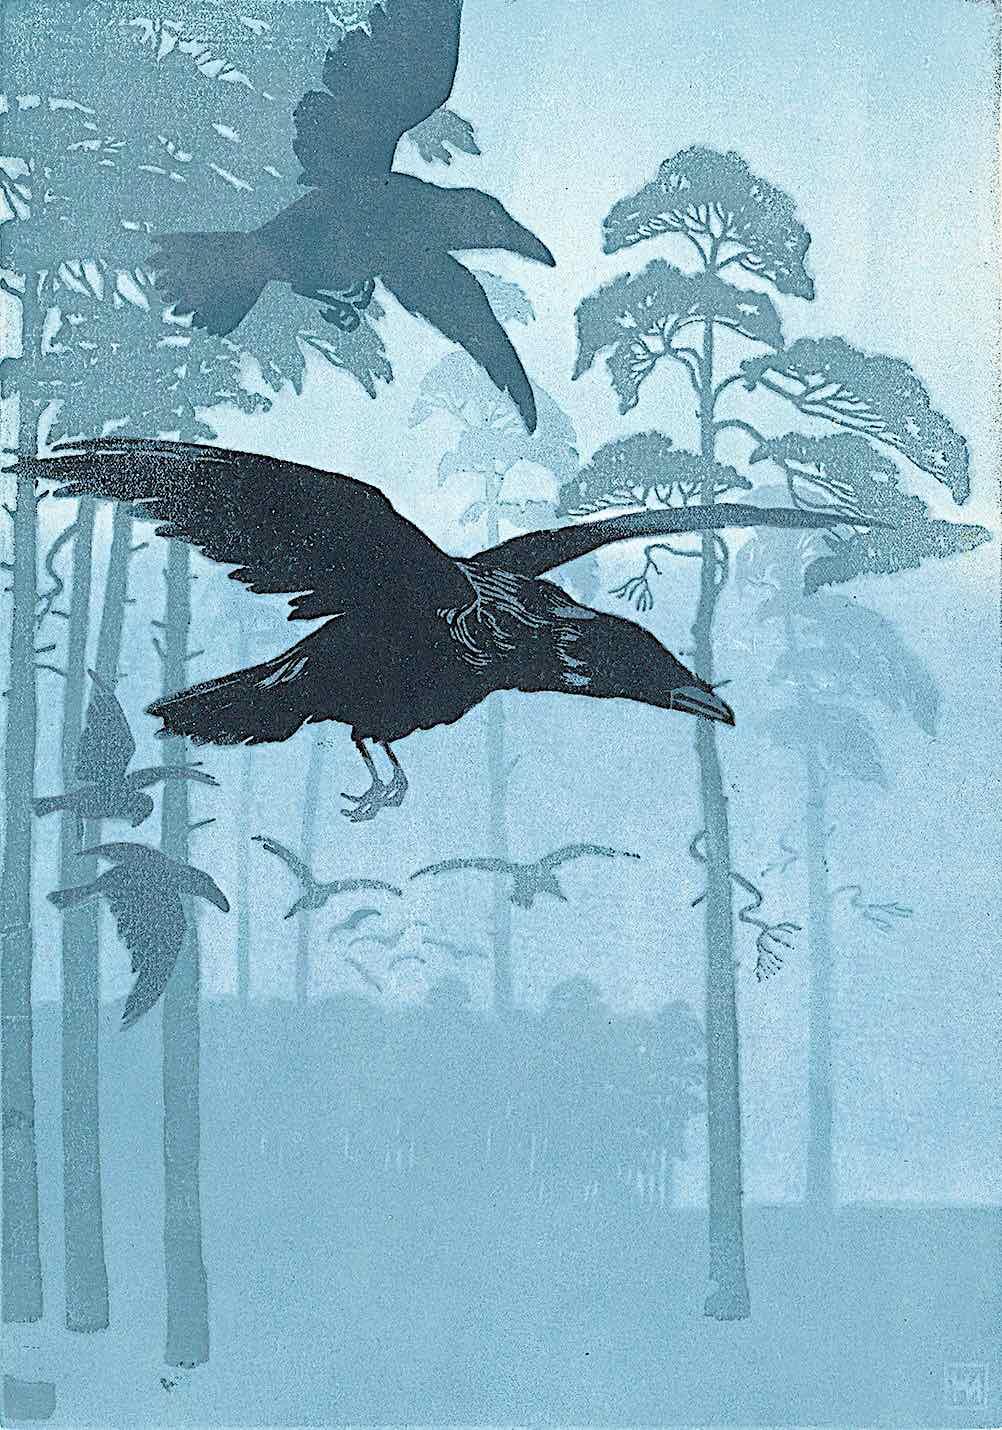 a Hans Neumann print of flying ravens